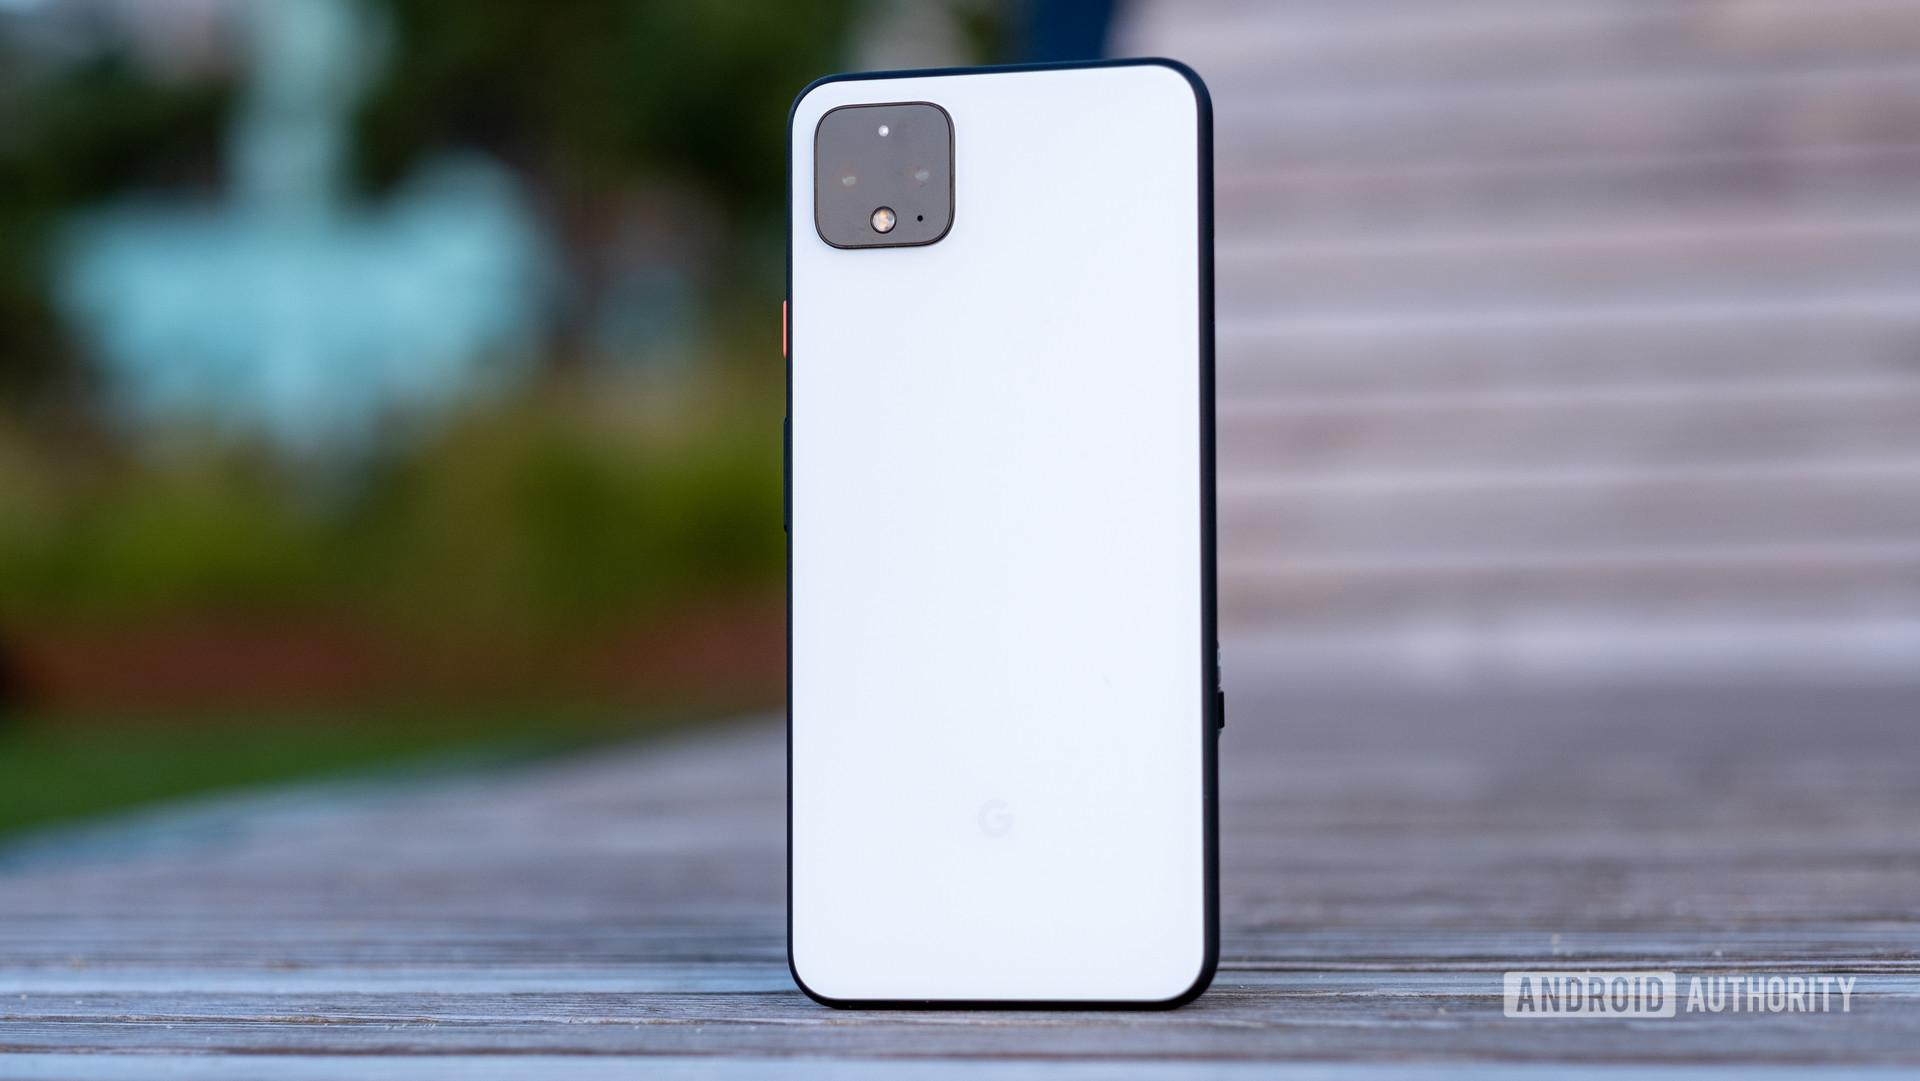 device's back panel on slight angle 18